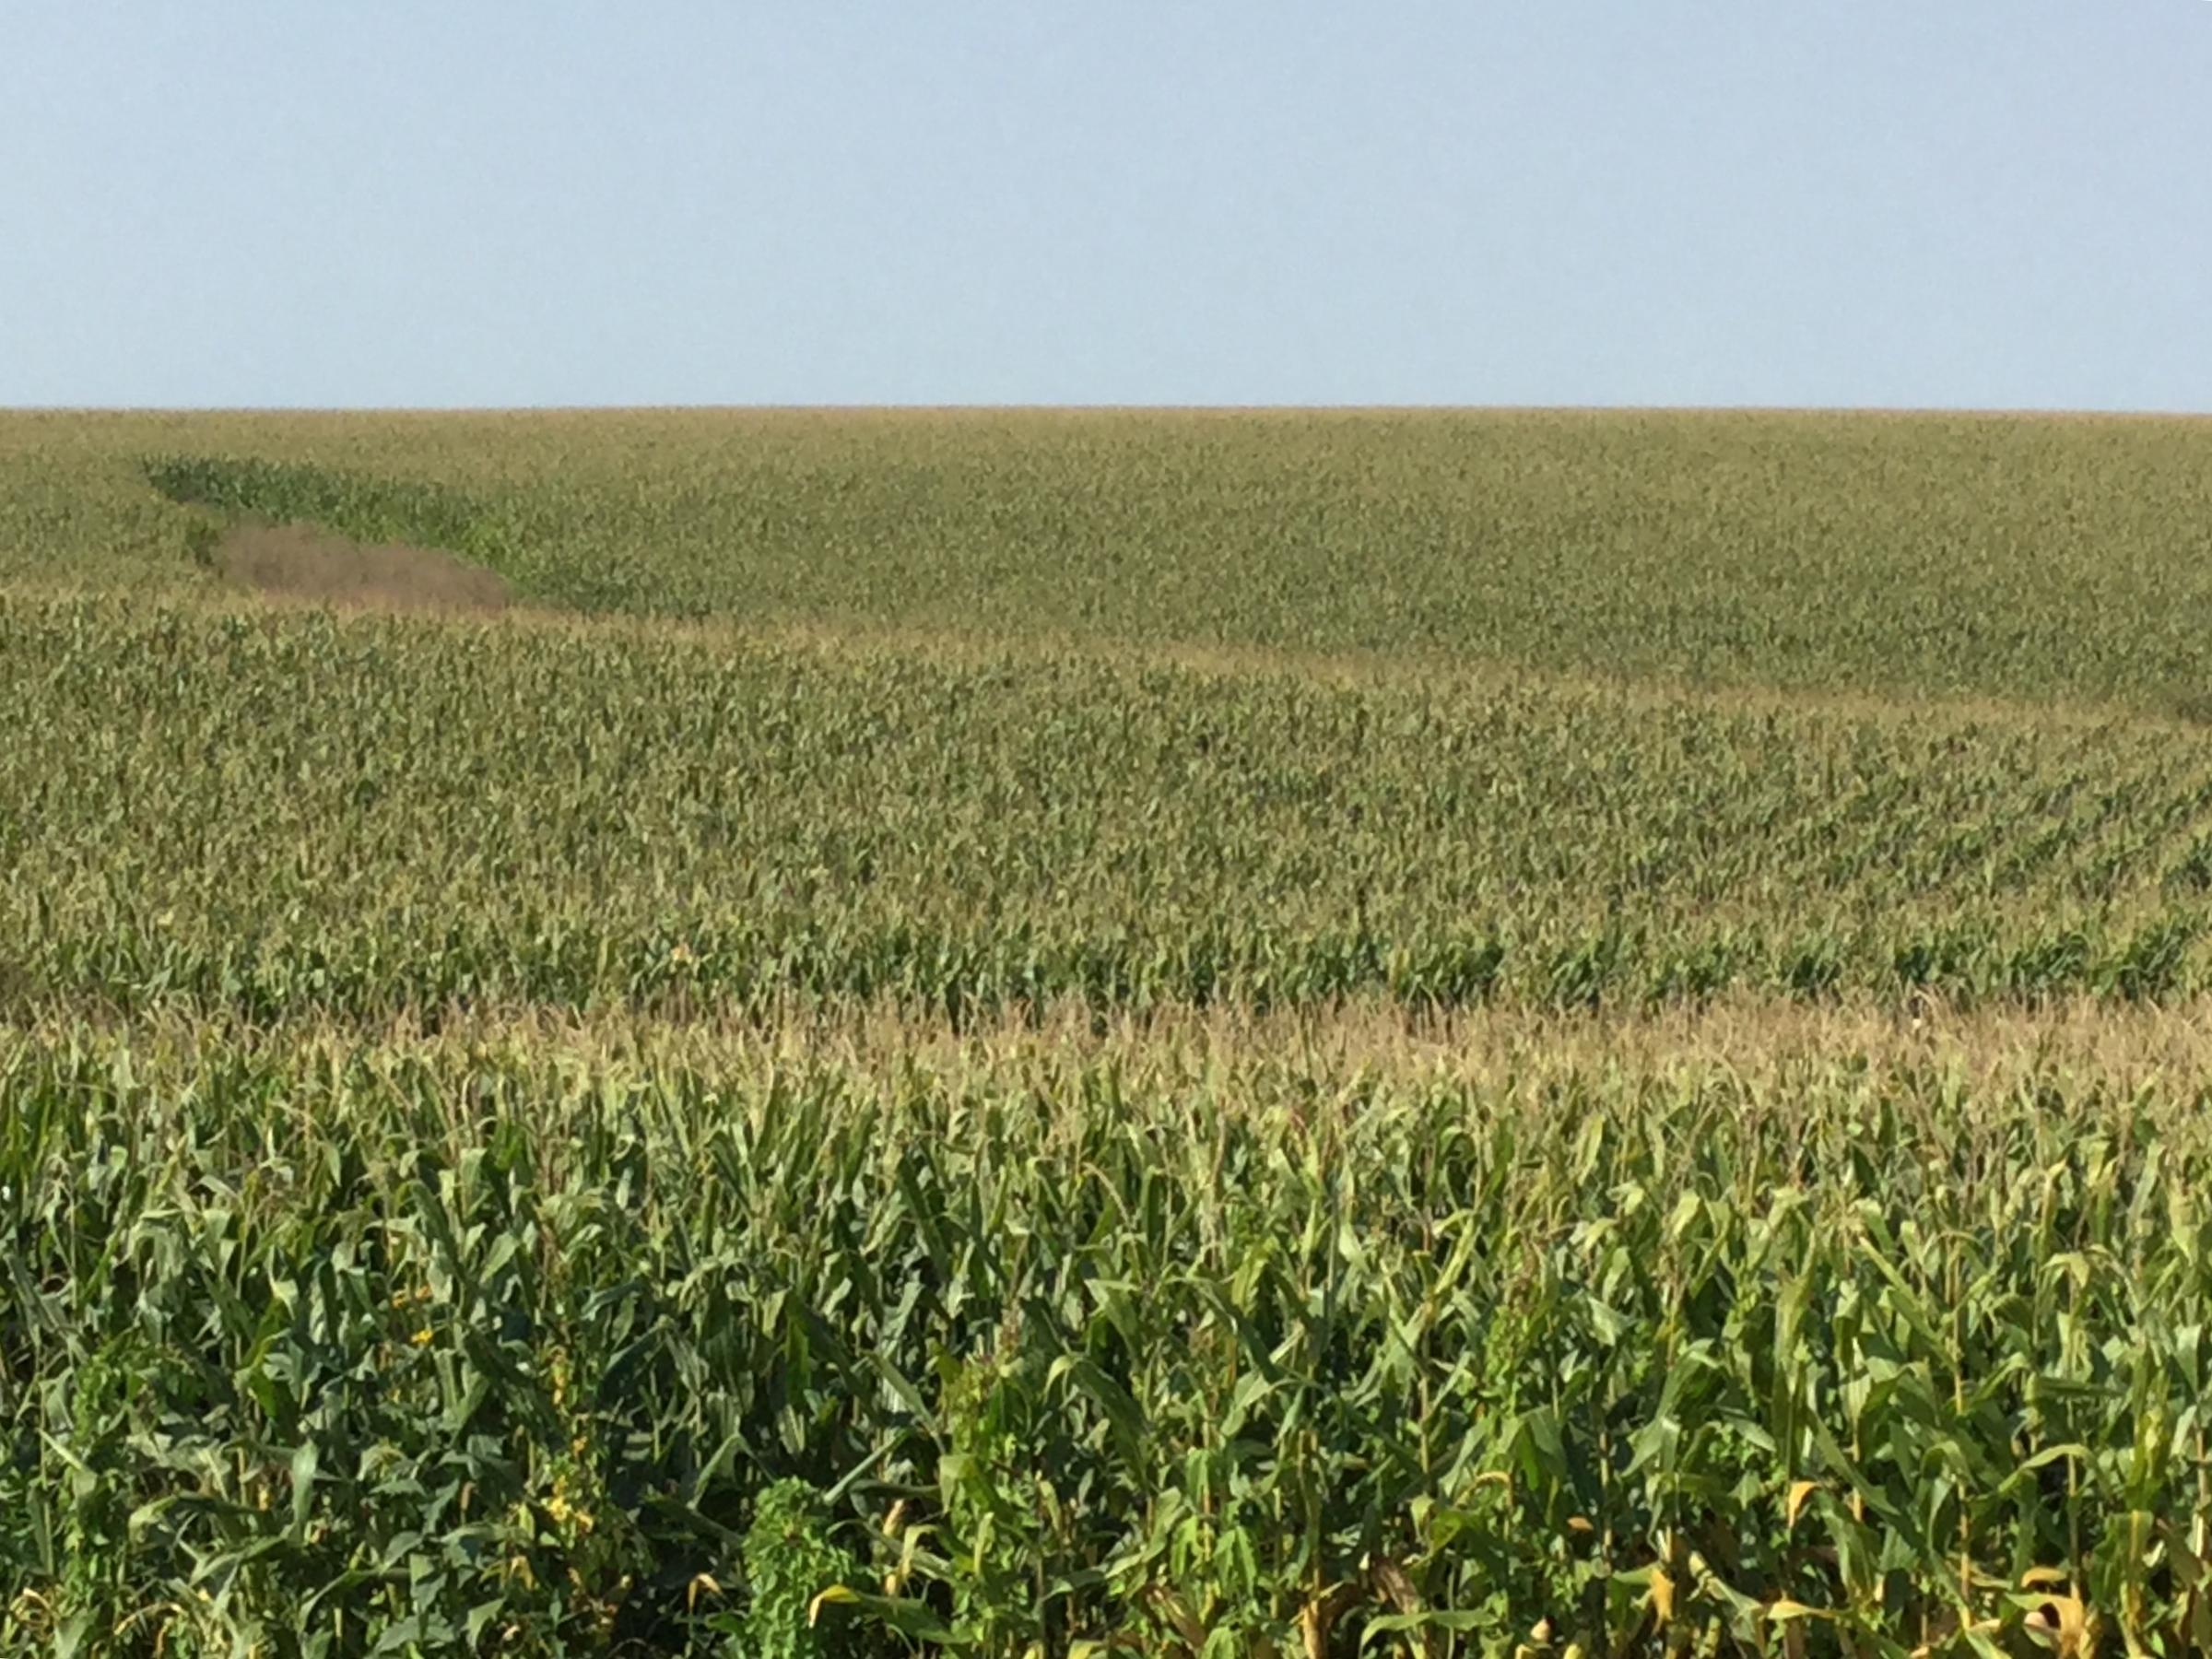 South Dakota Corn, Soybean Crop to Decline This Year